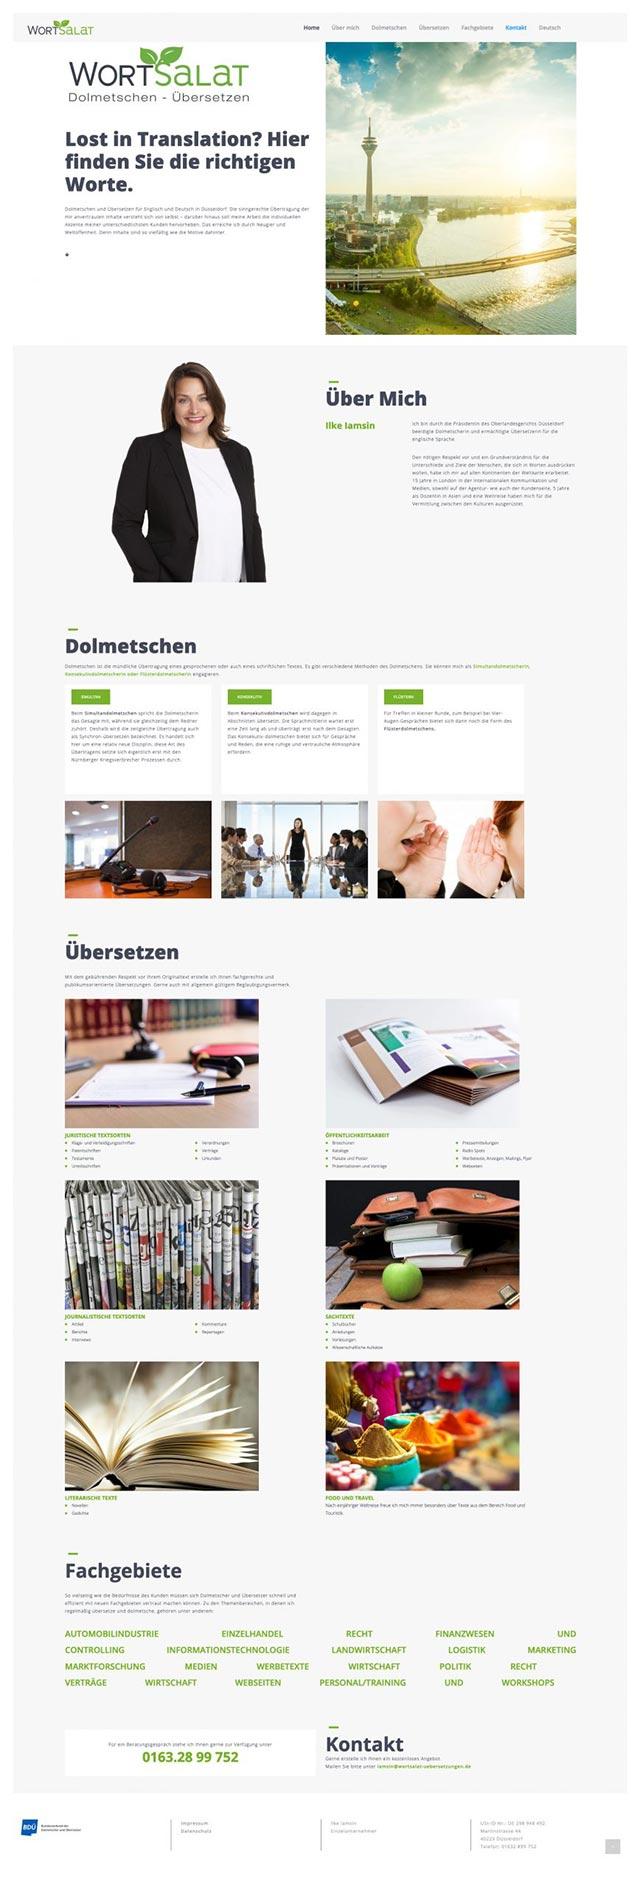 coolpack webdesign düsseldorf - Wortsalat